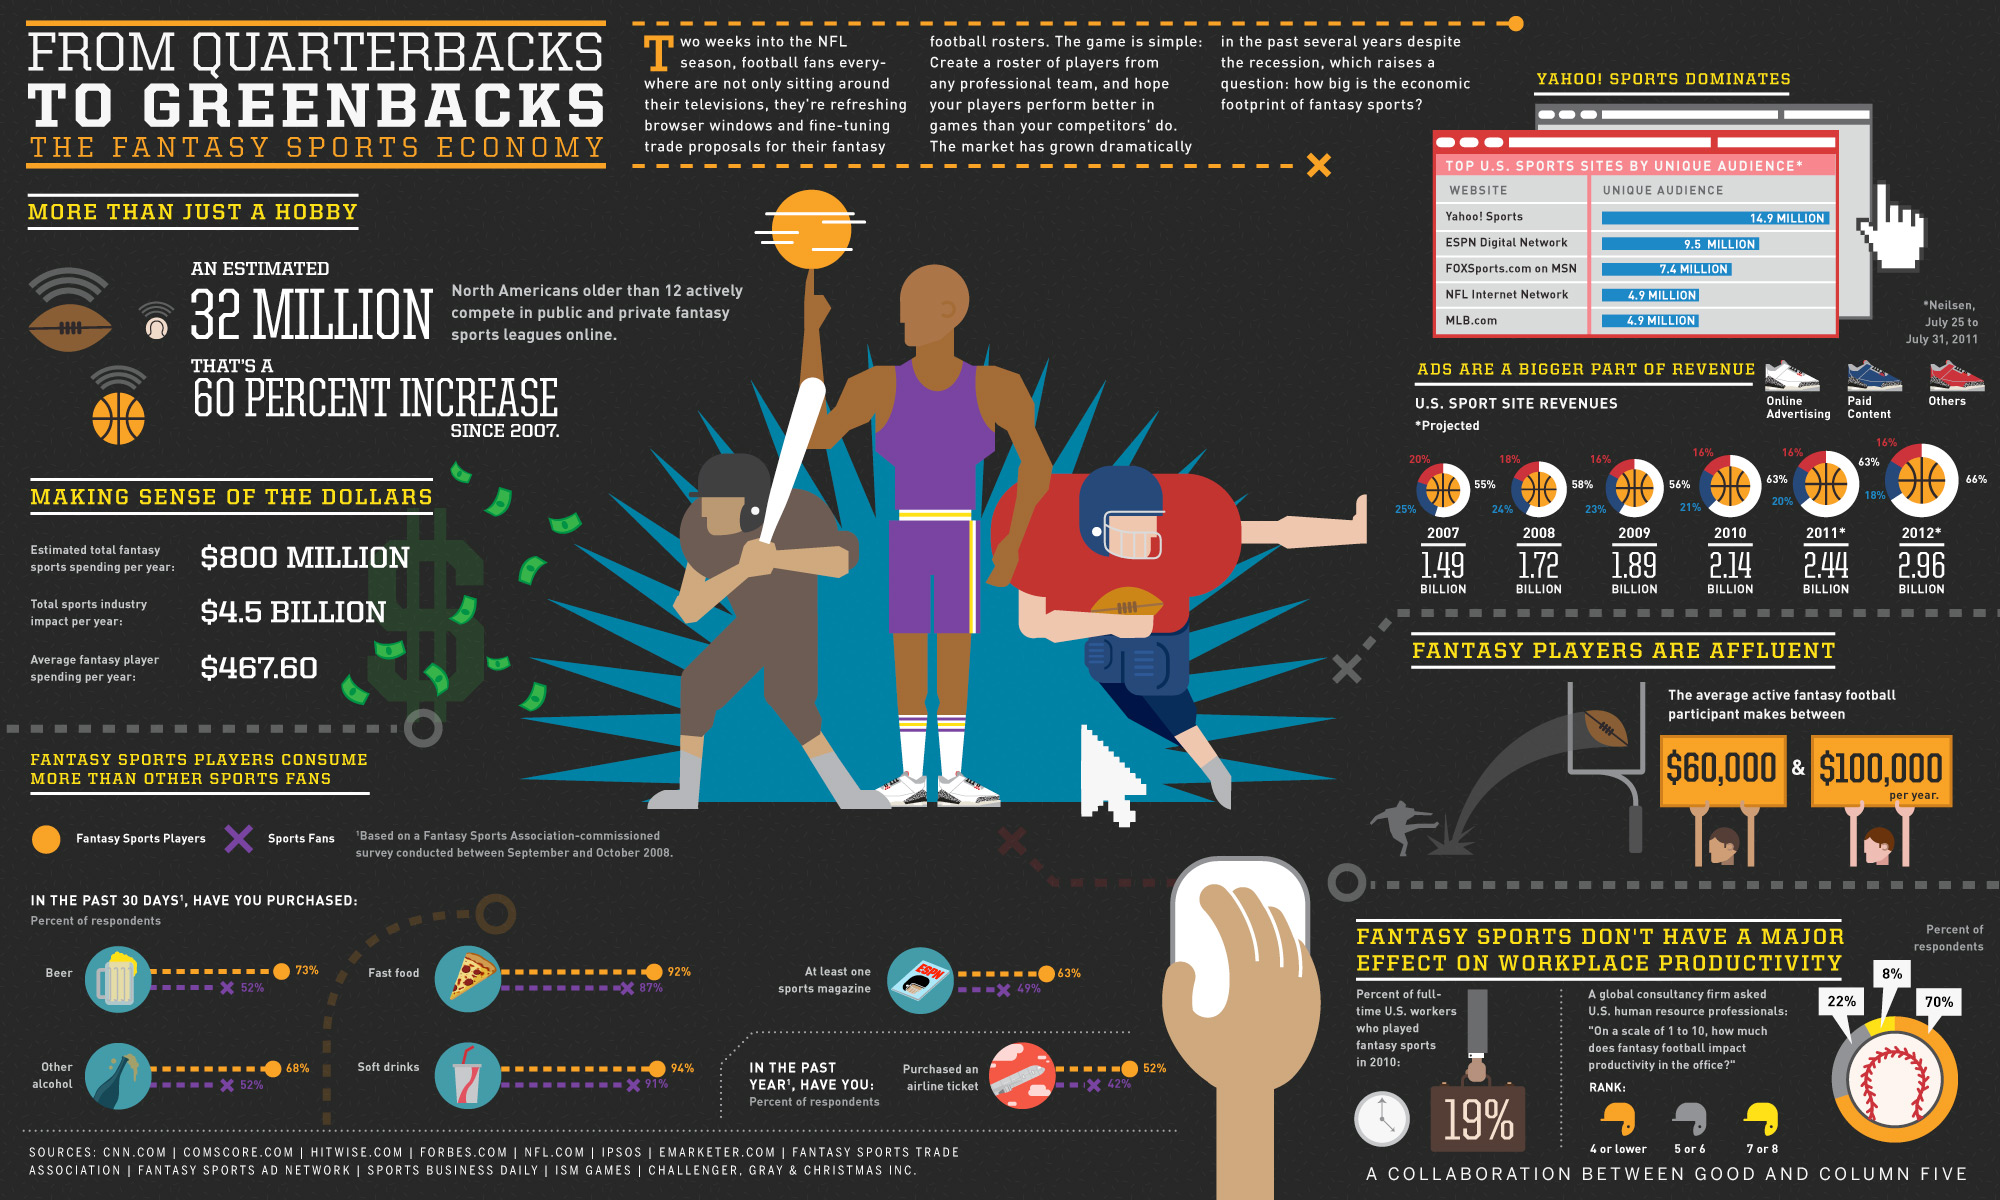 good infographic the fantasy sports economy jpeg column five